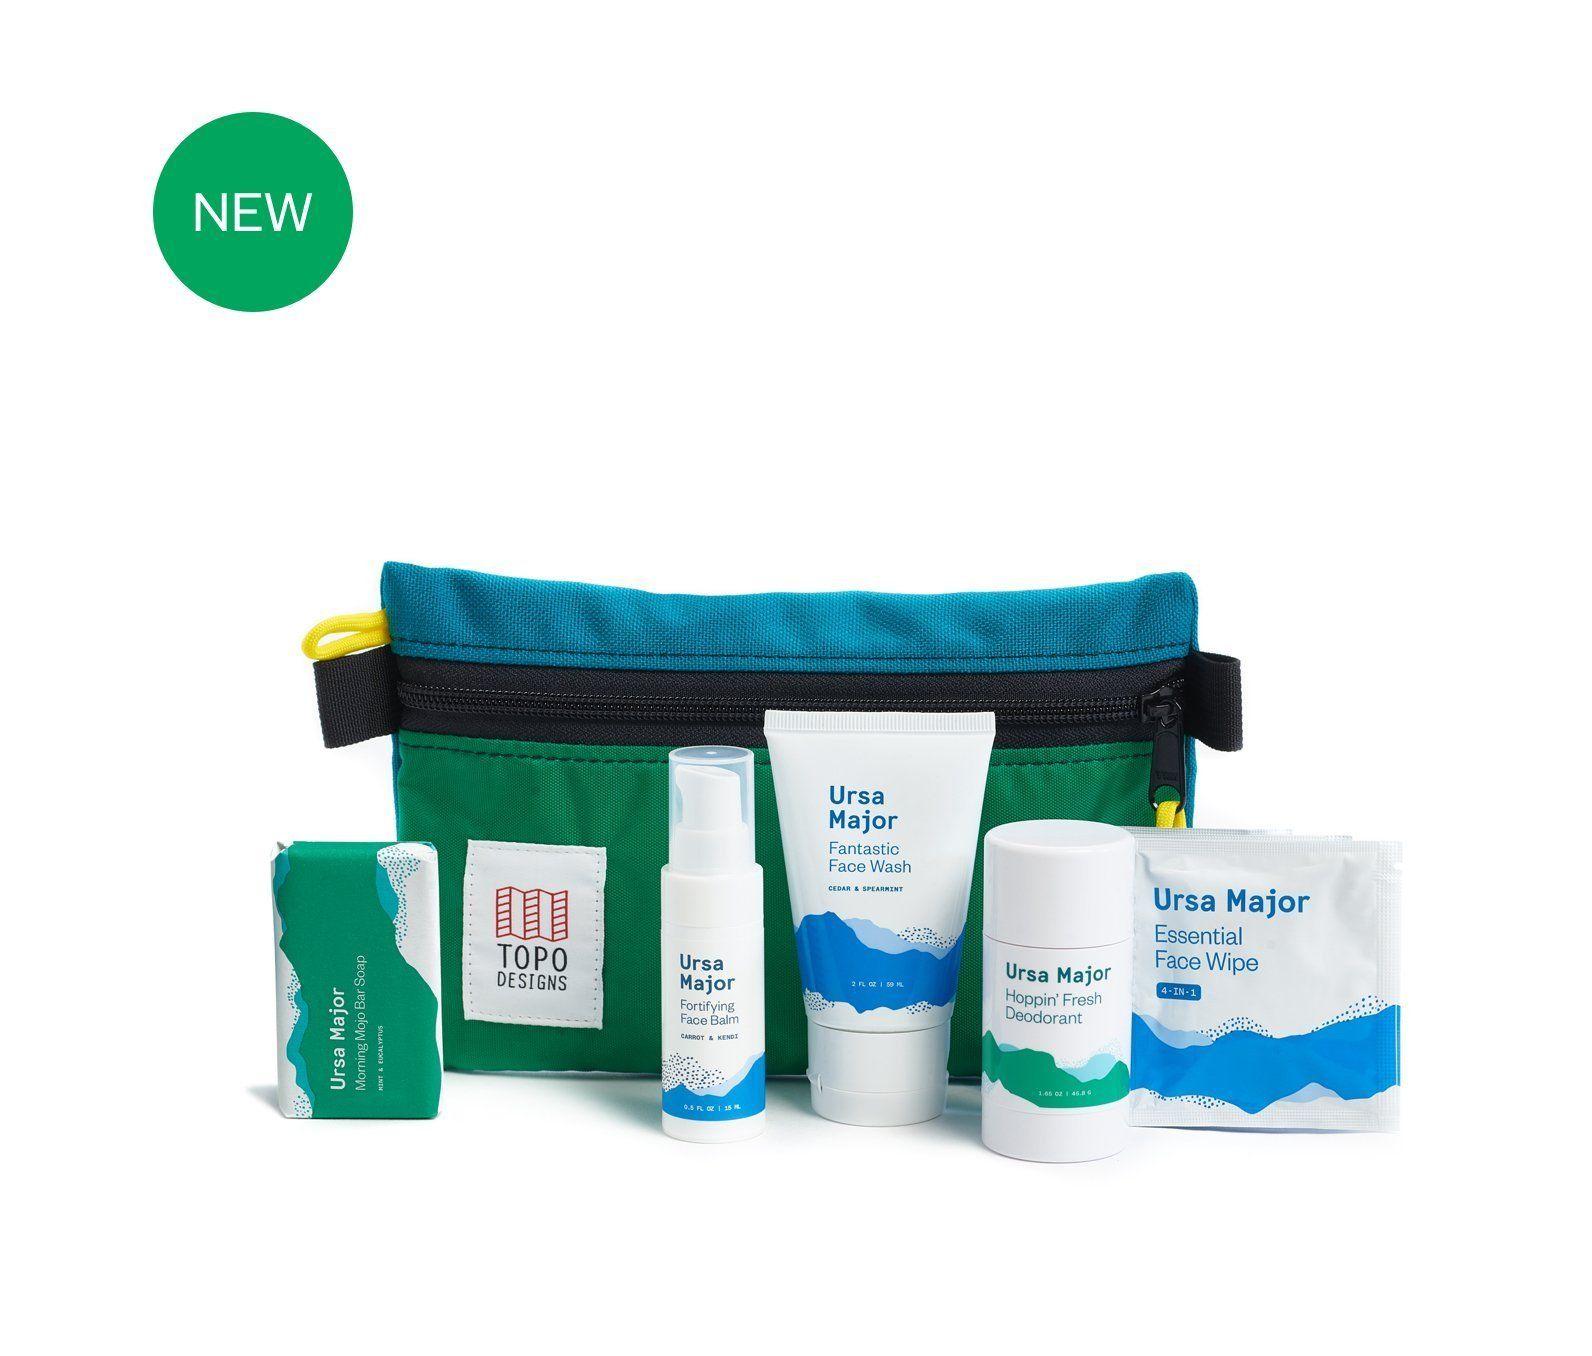 Ursa Major X Topo Designs Travel Kit Topo Designs Travel Kits Travel Size Products